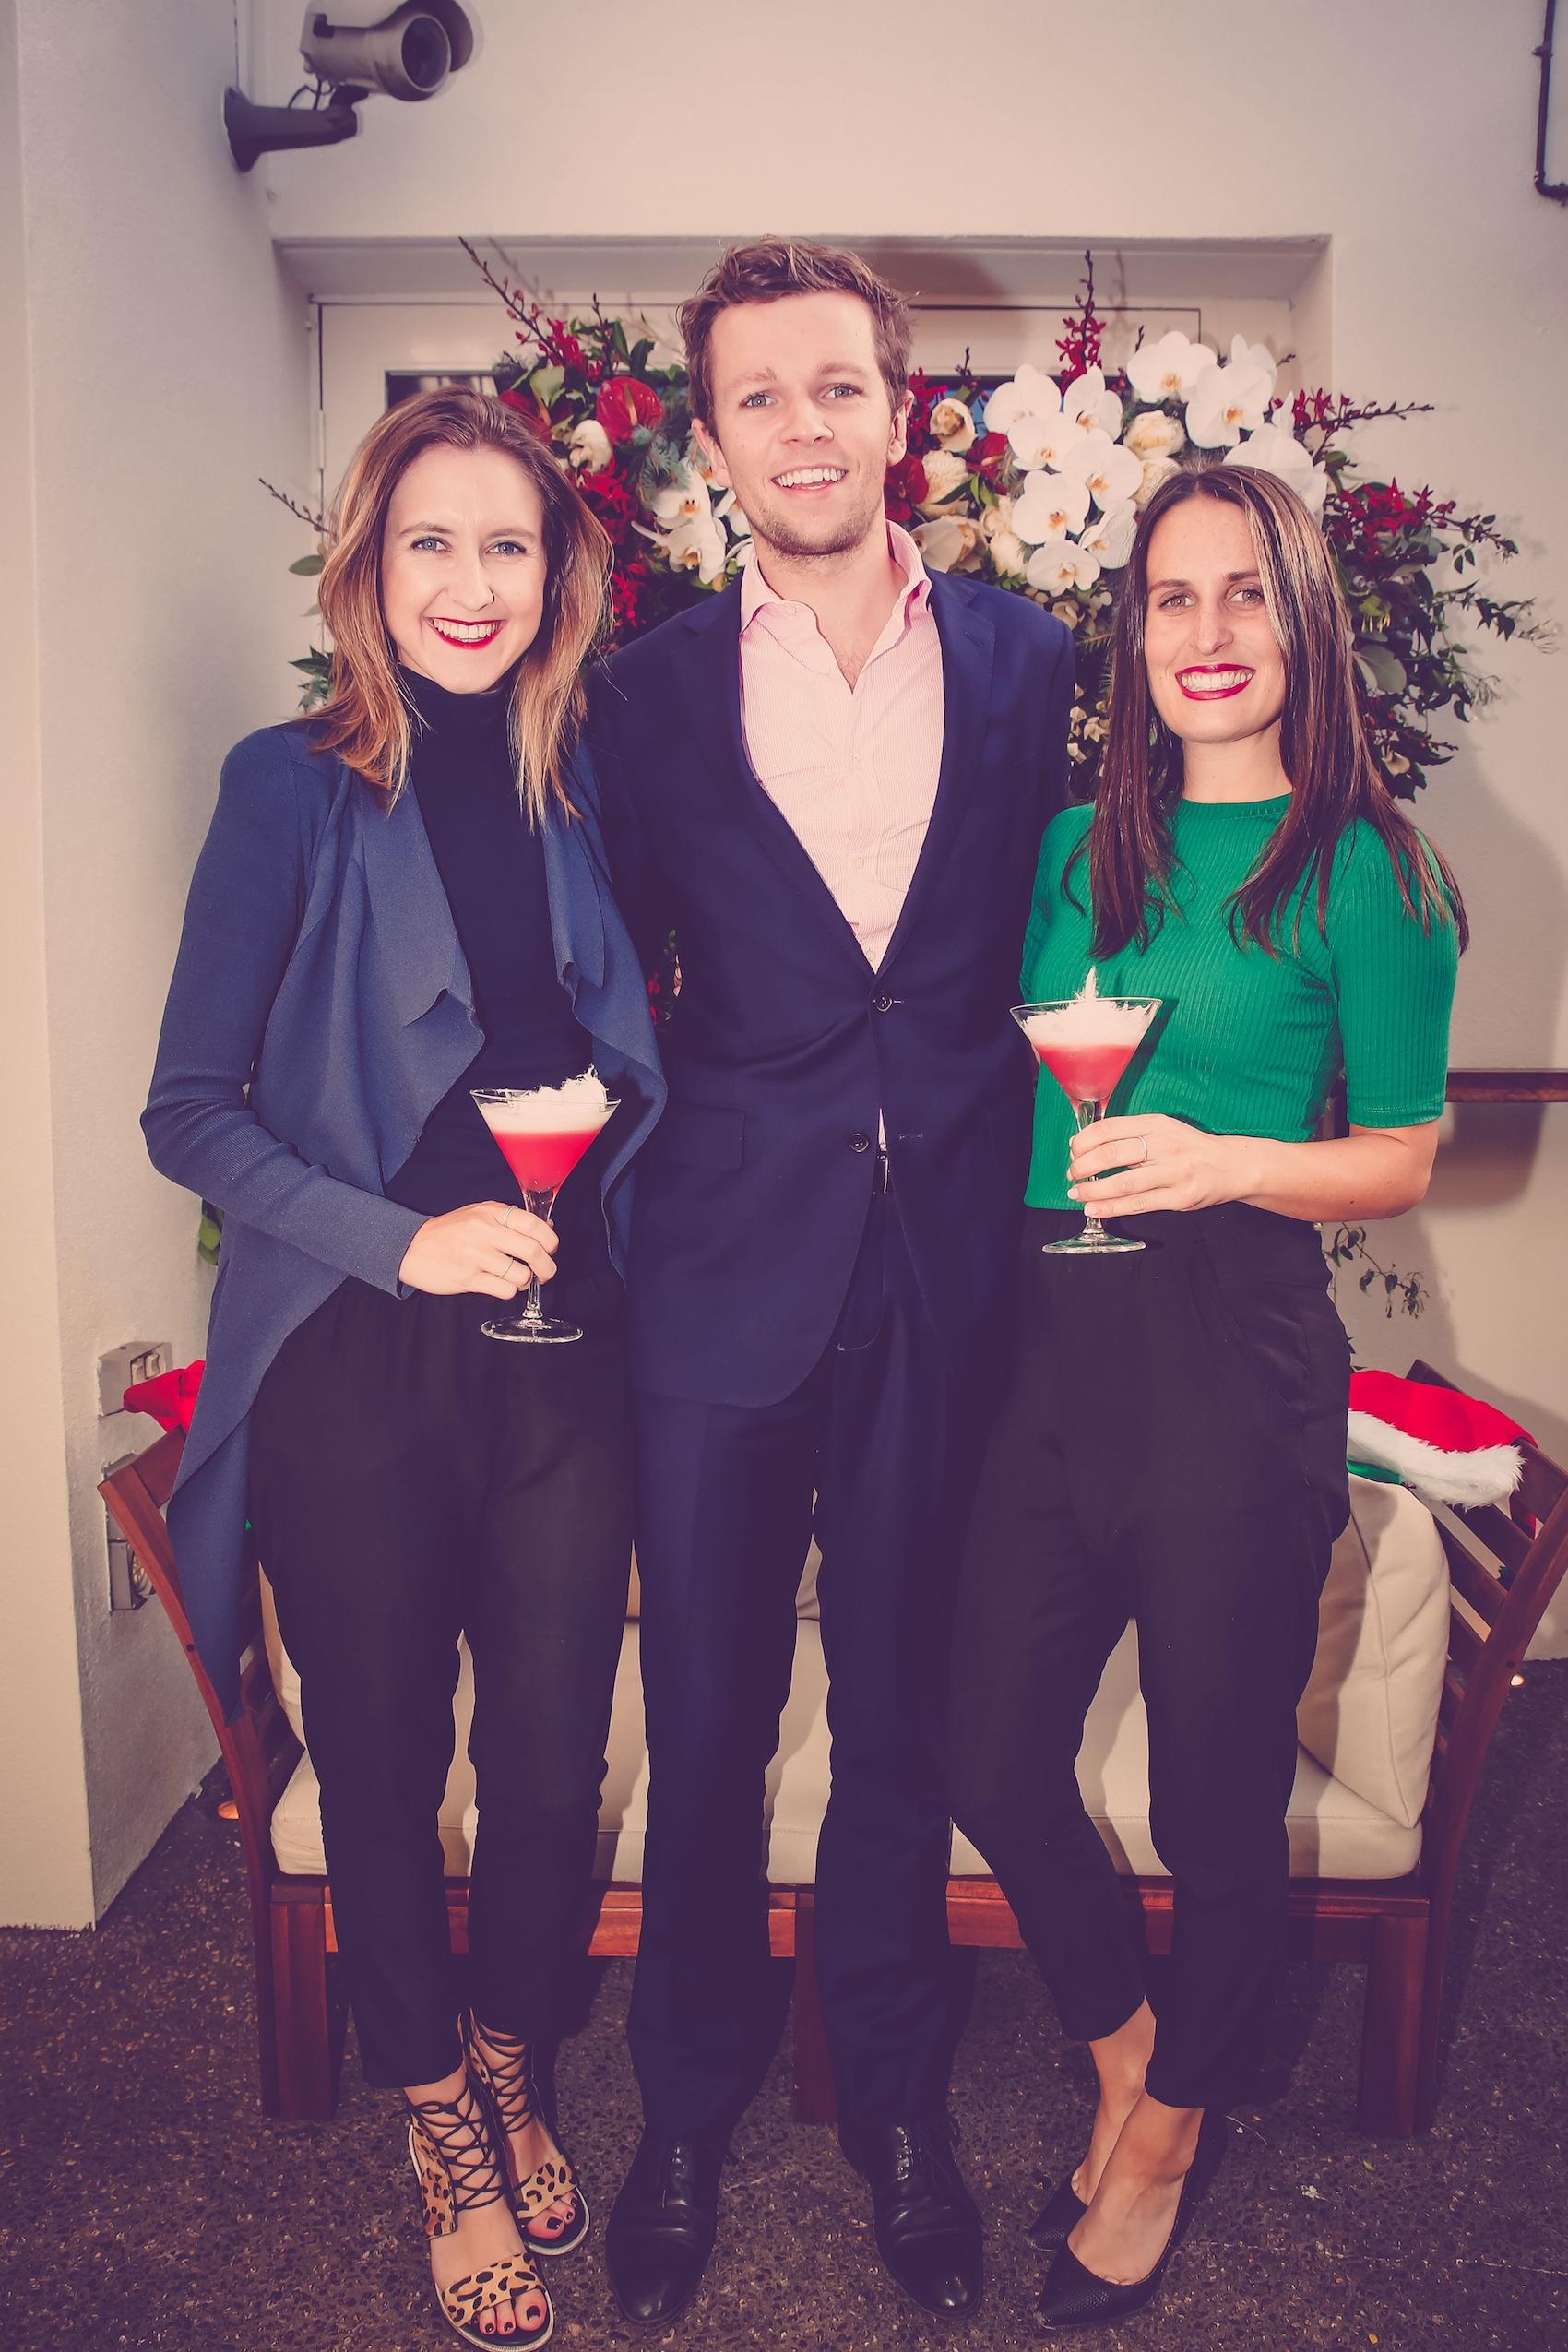 toko-melbourne-christmas-party-ashleigh-otter-matt walsh-catherine-wilcox.jpg